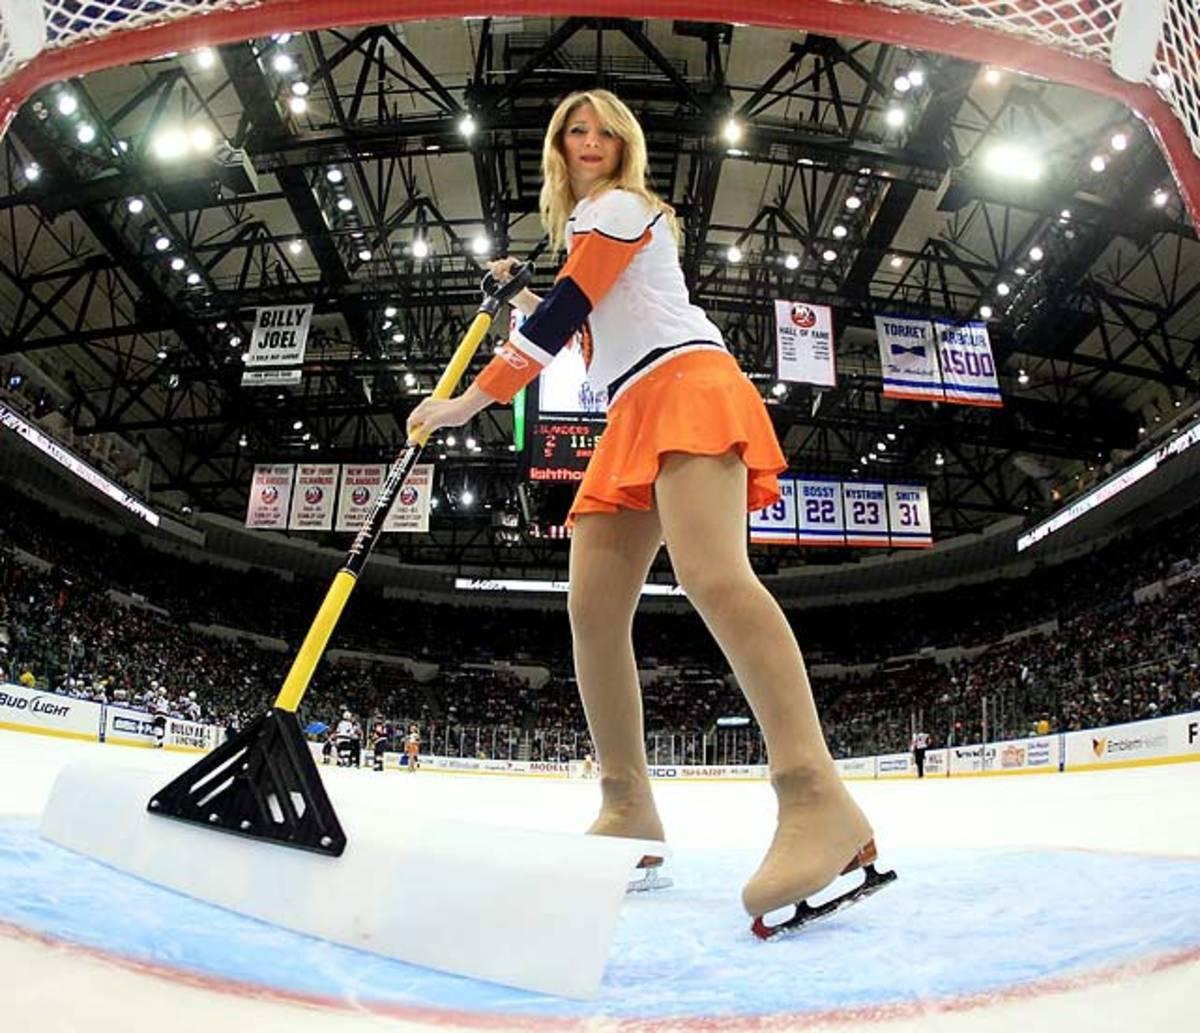 islanders-ice-girl%2824%29.jpg